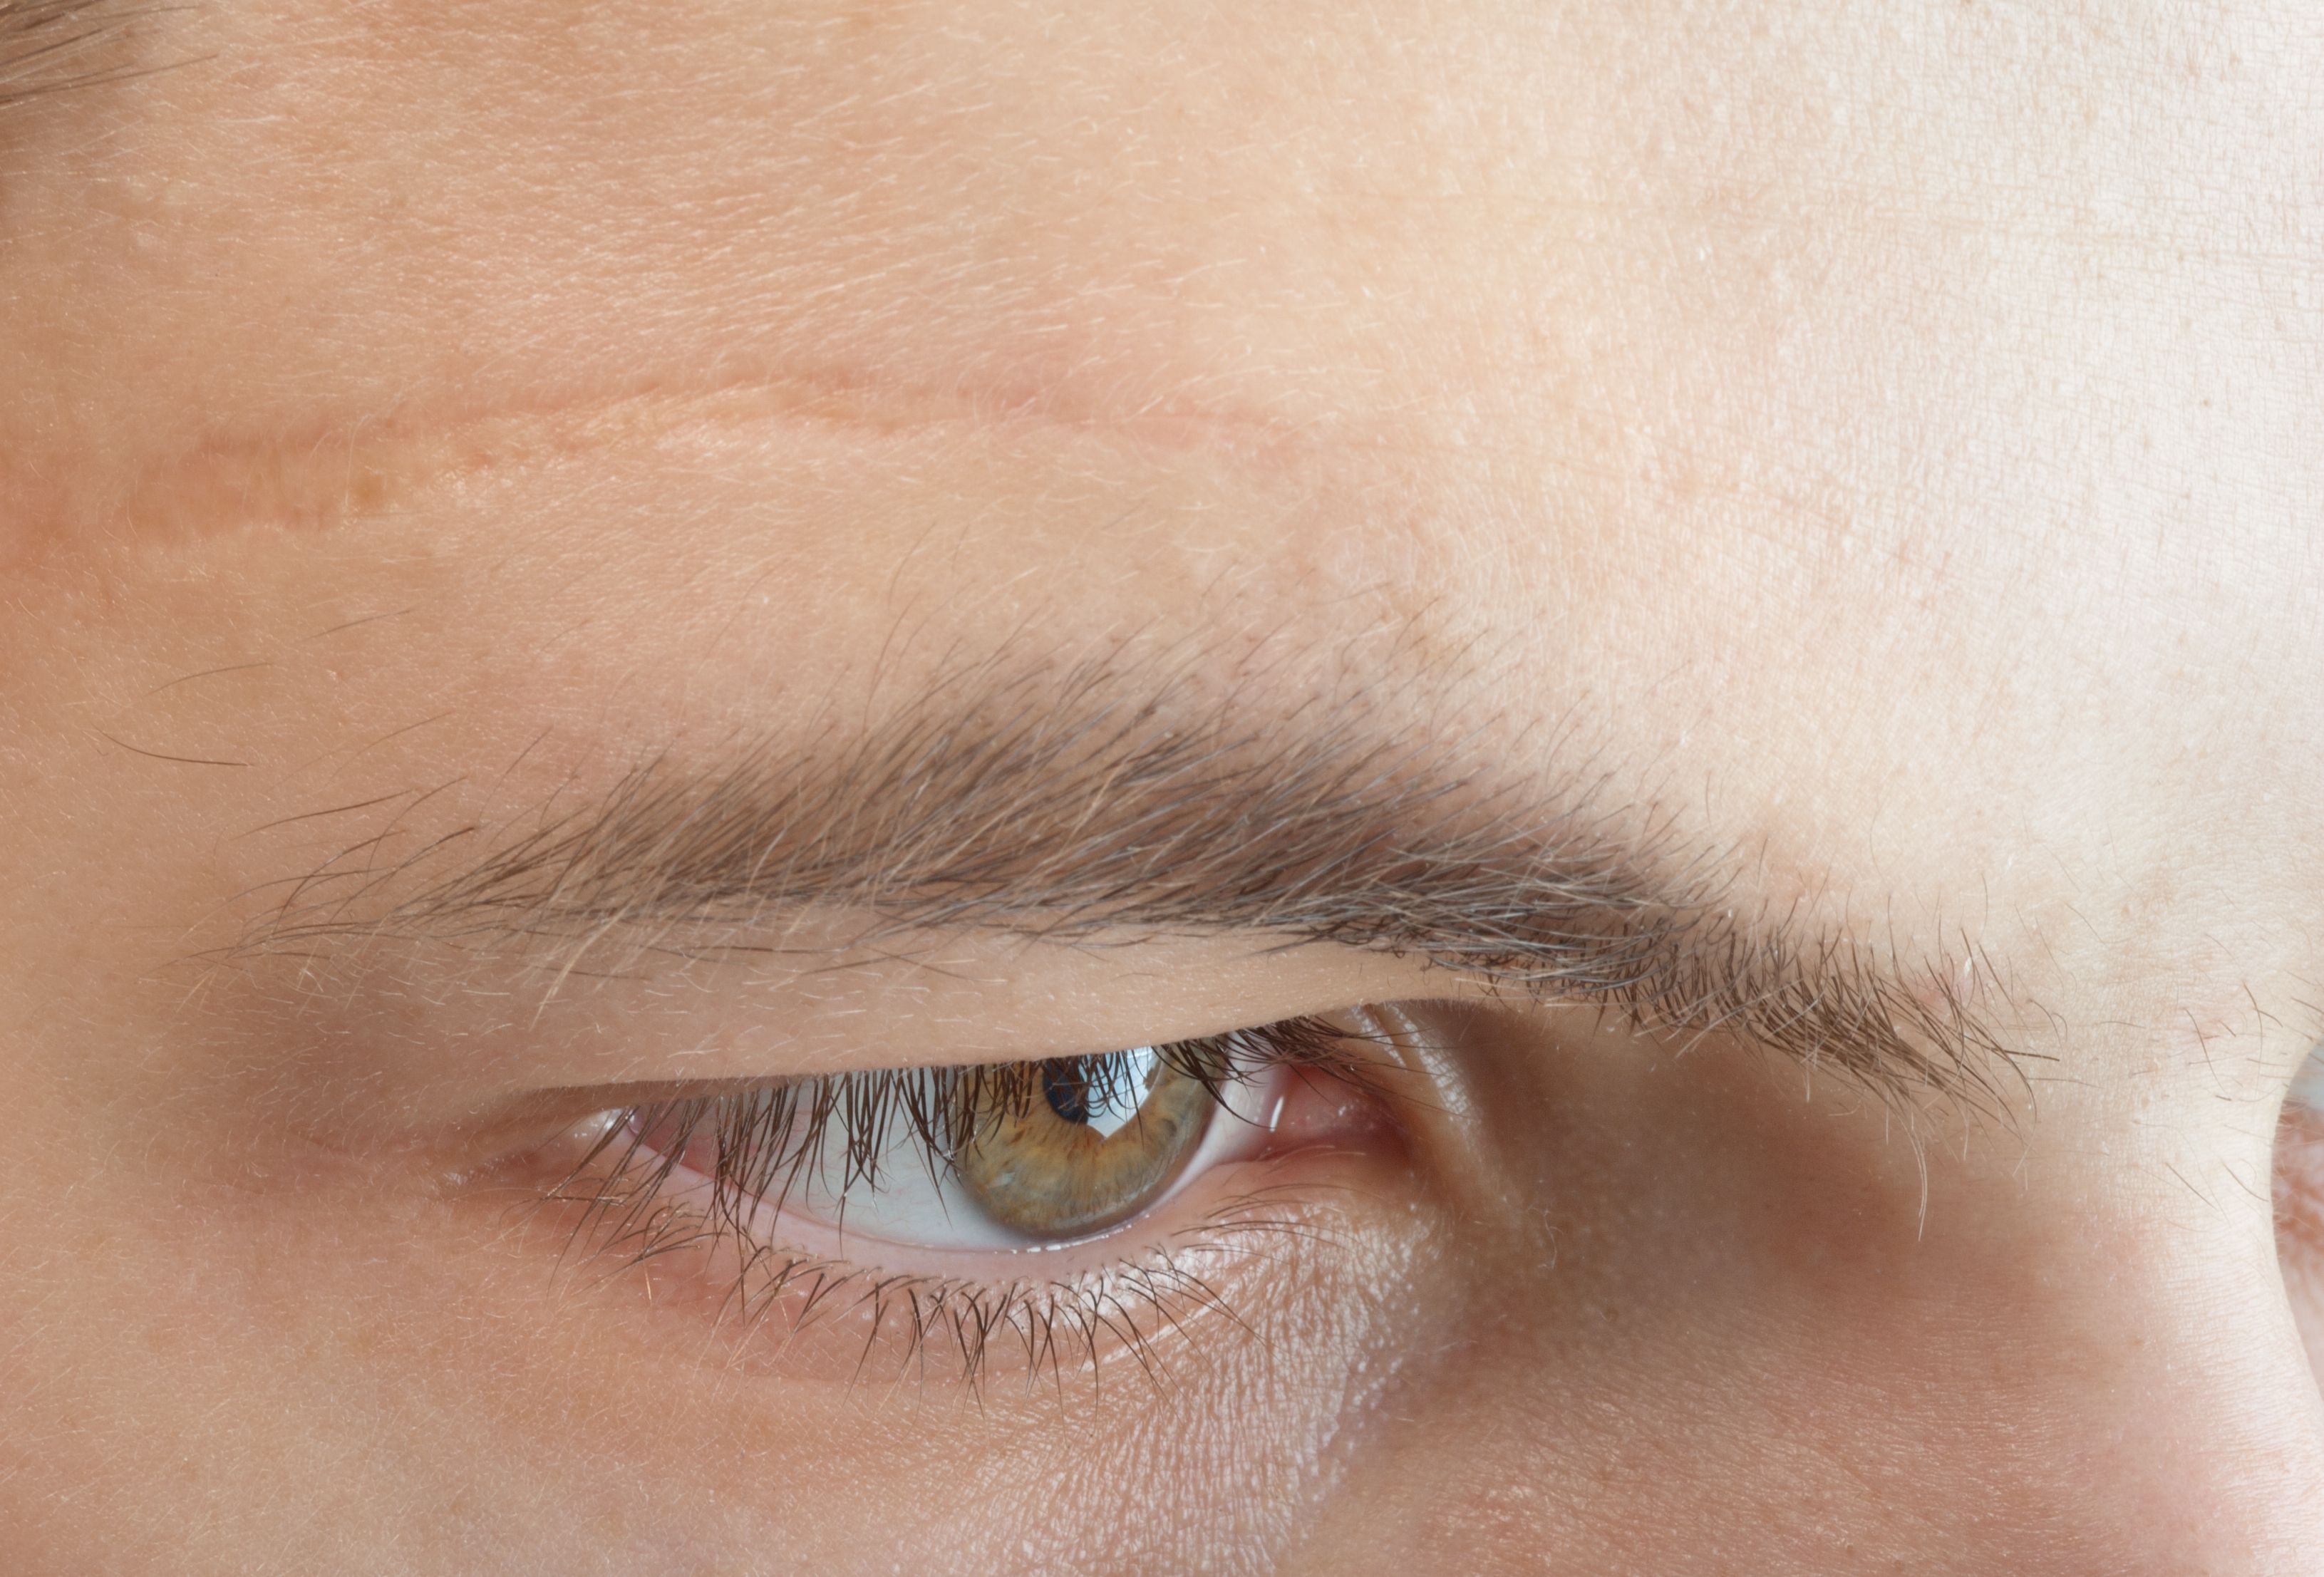 Faded scar